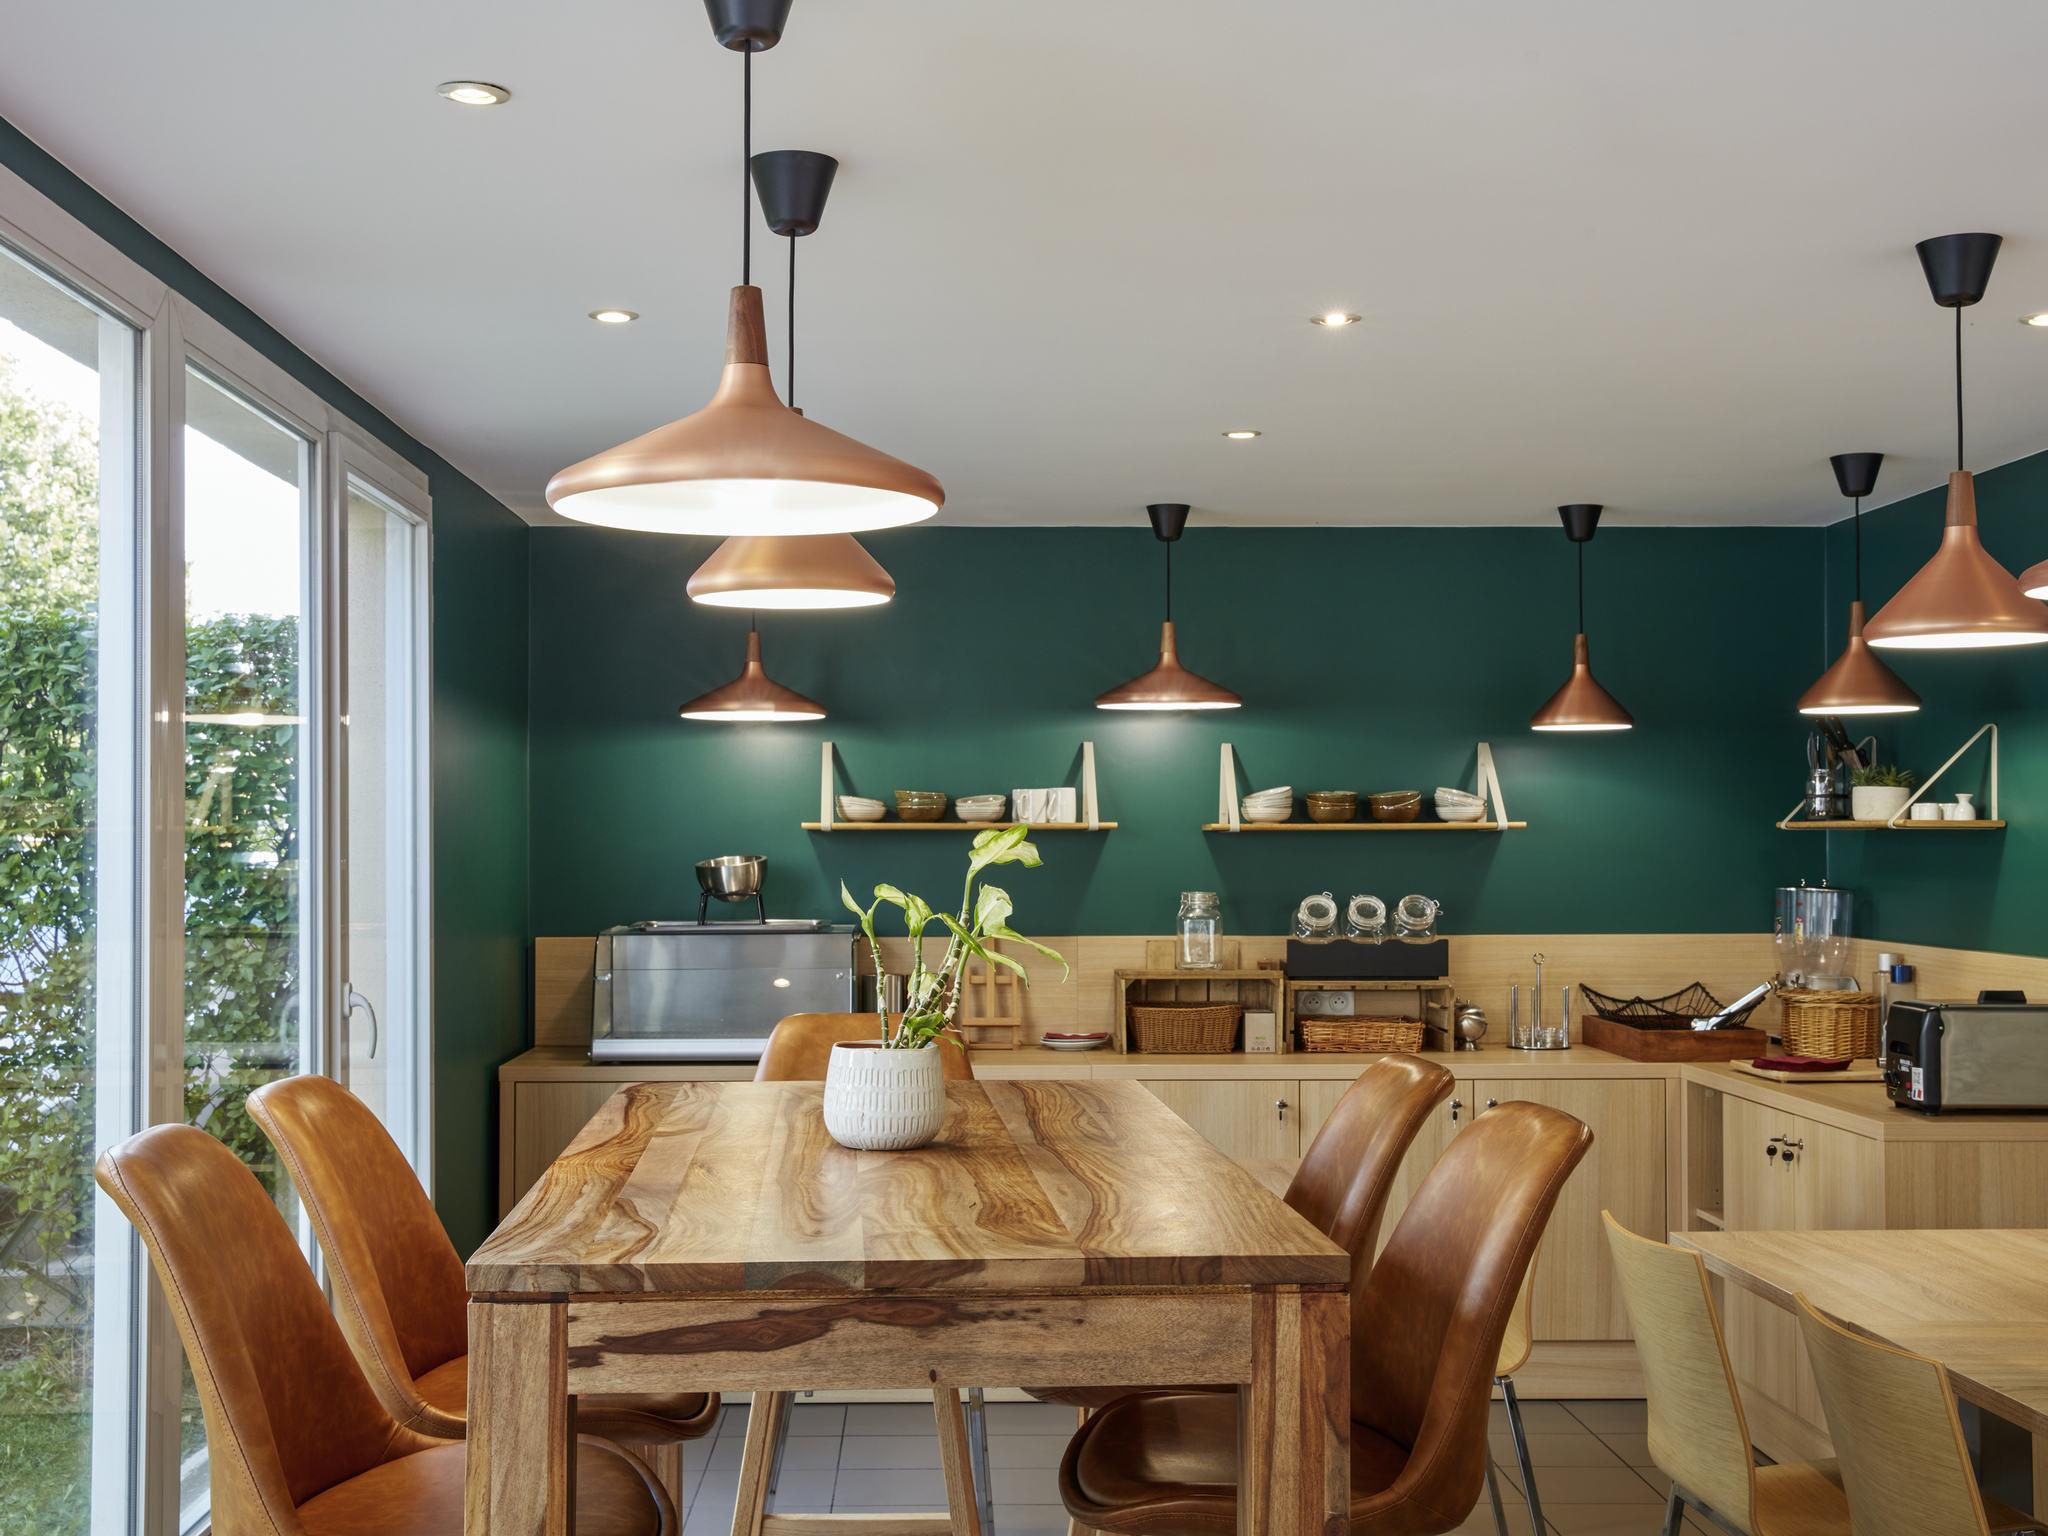 Hotel – Aparthotel Adagio access Carrières-sous-Poissy